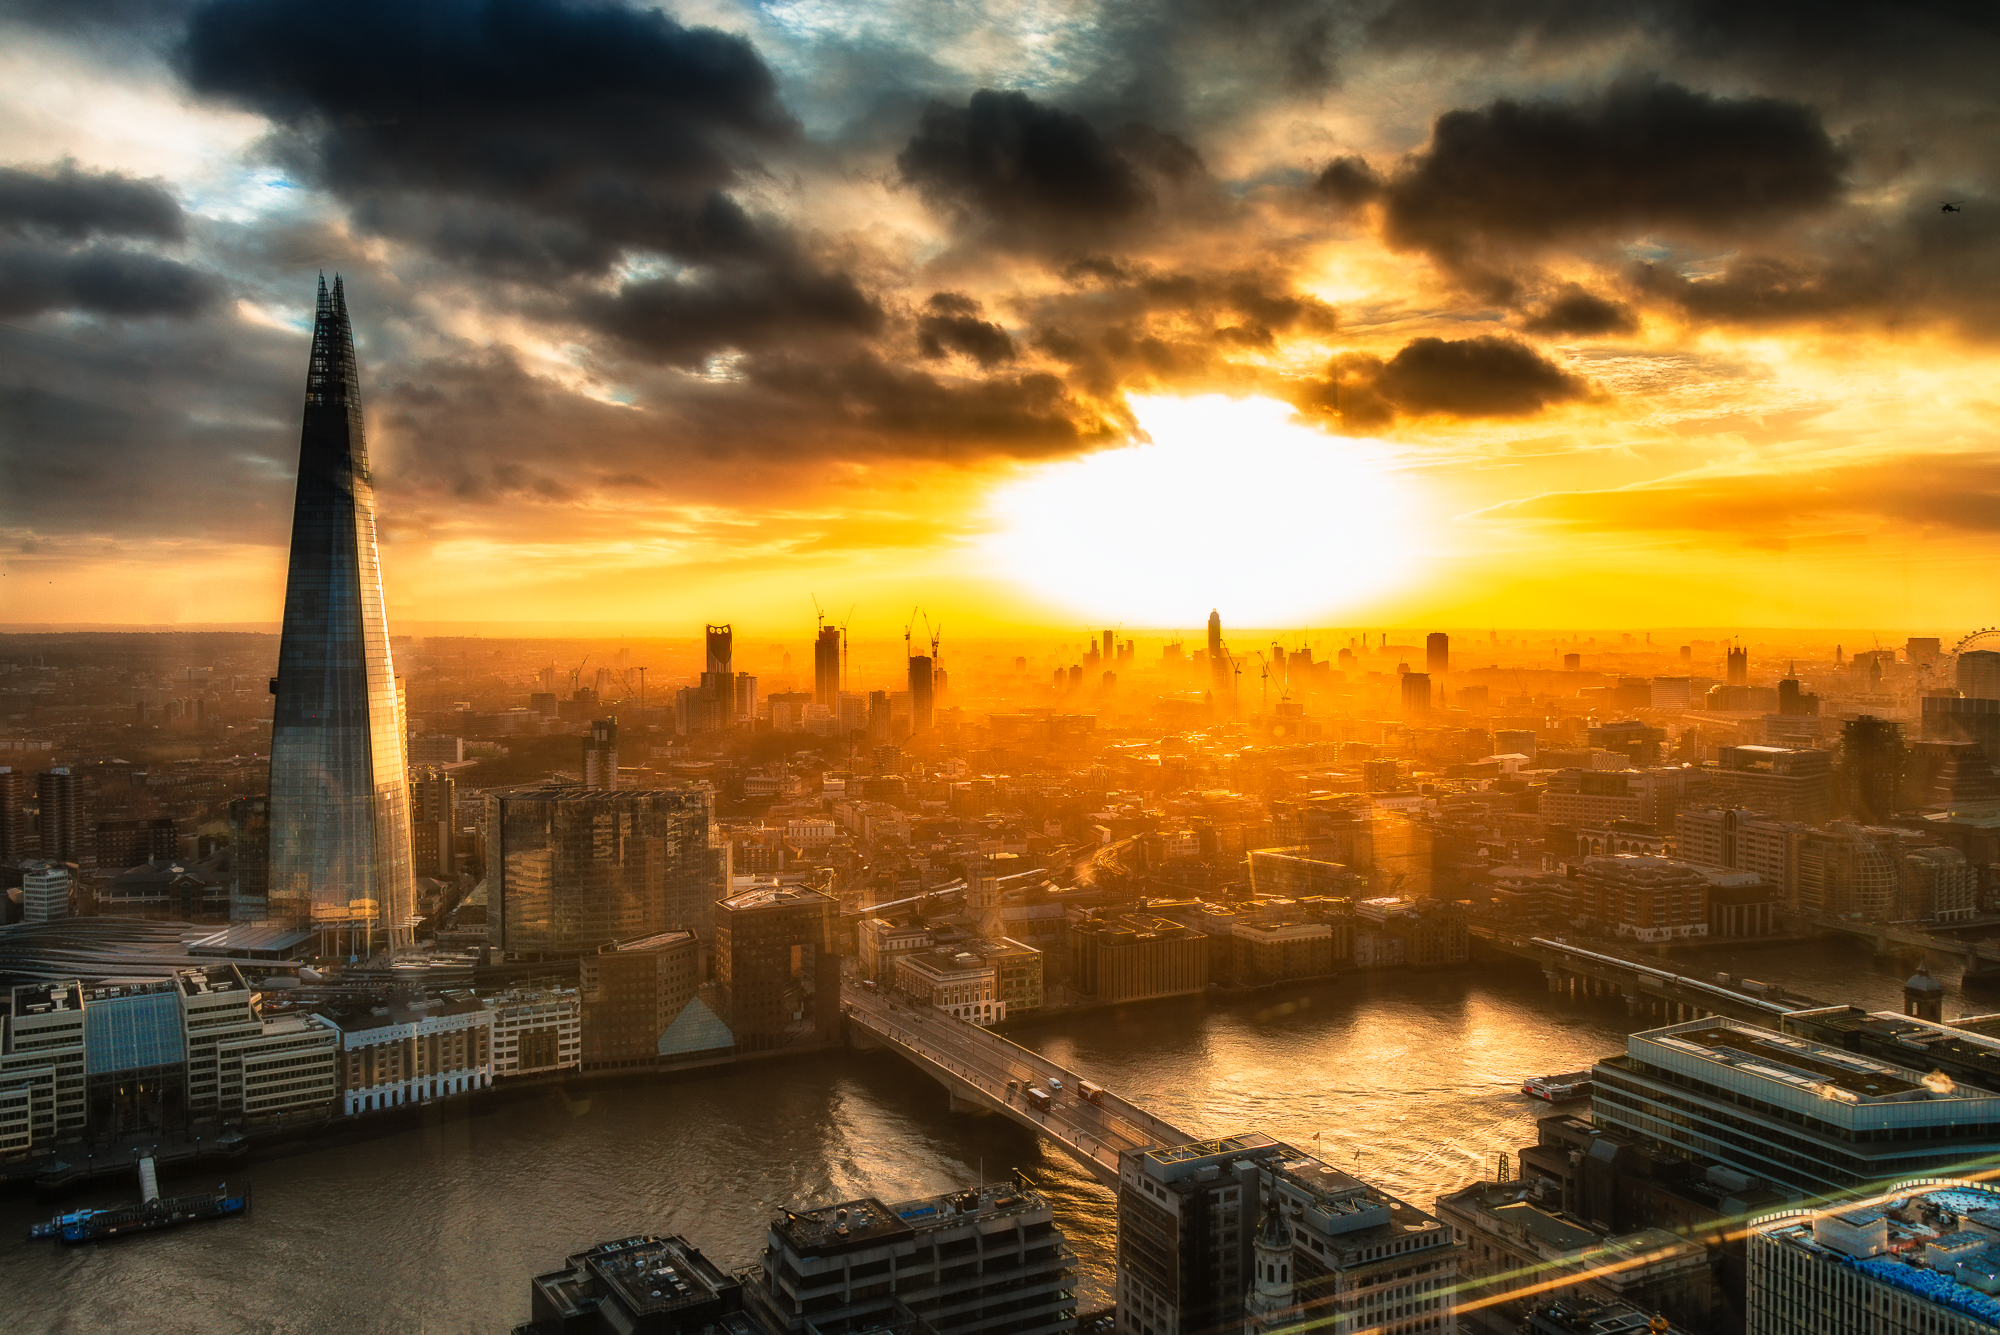 London Cityscape, United Kingdom